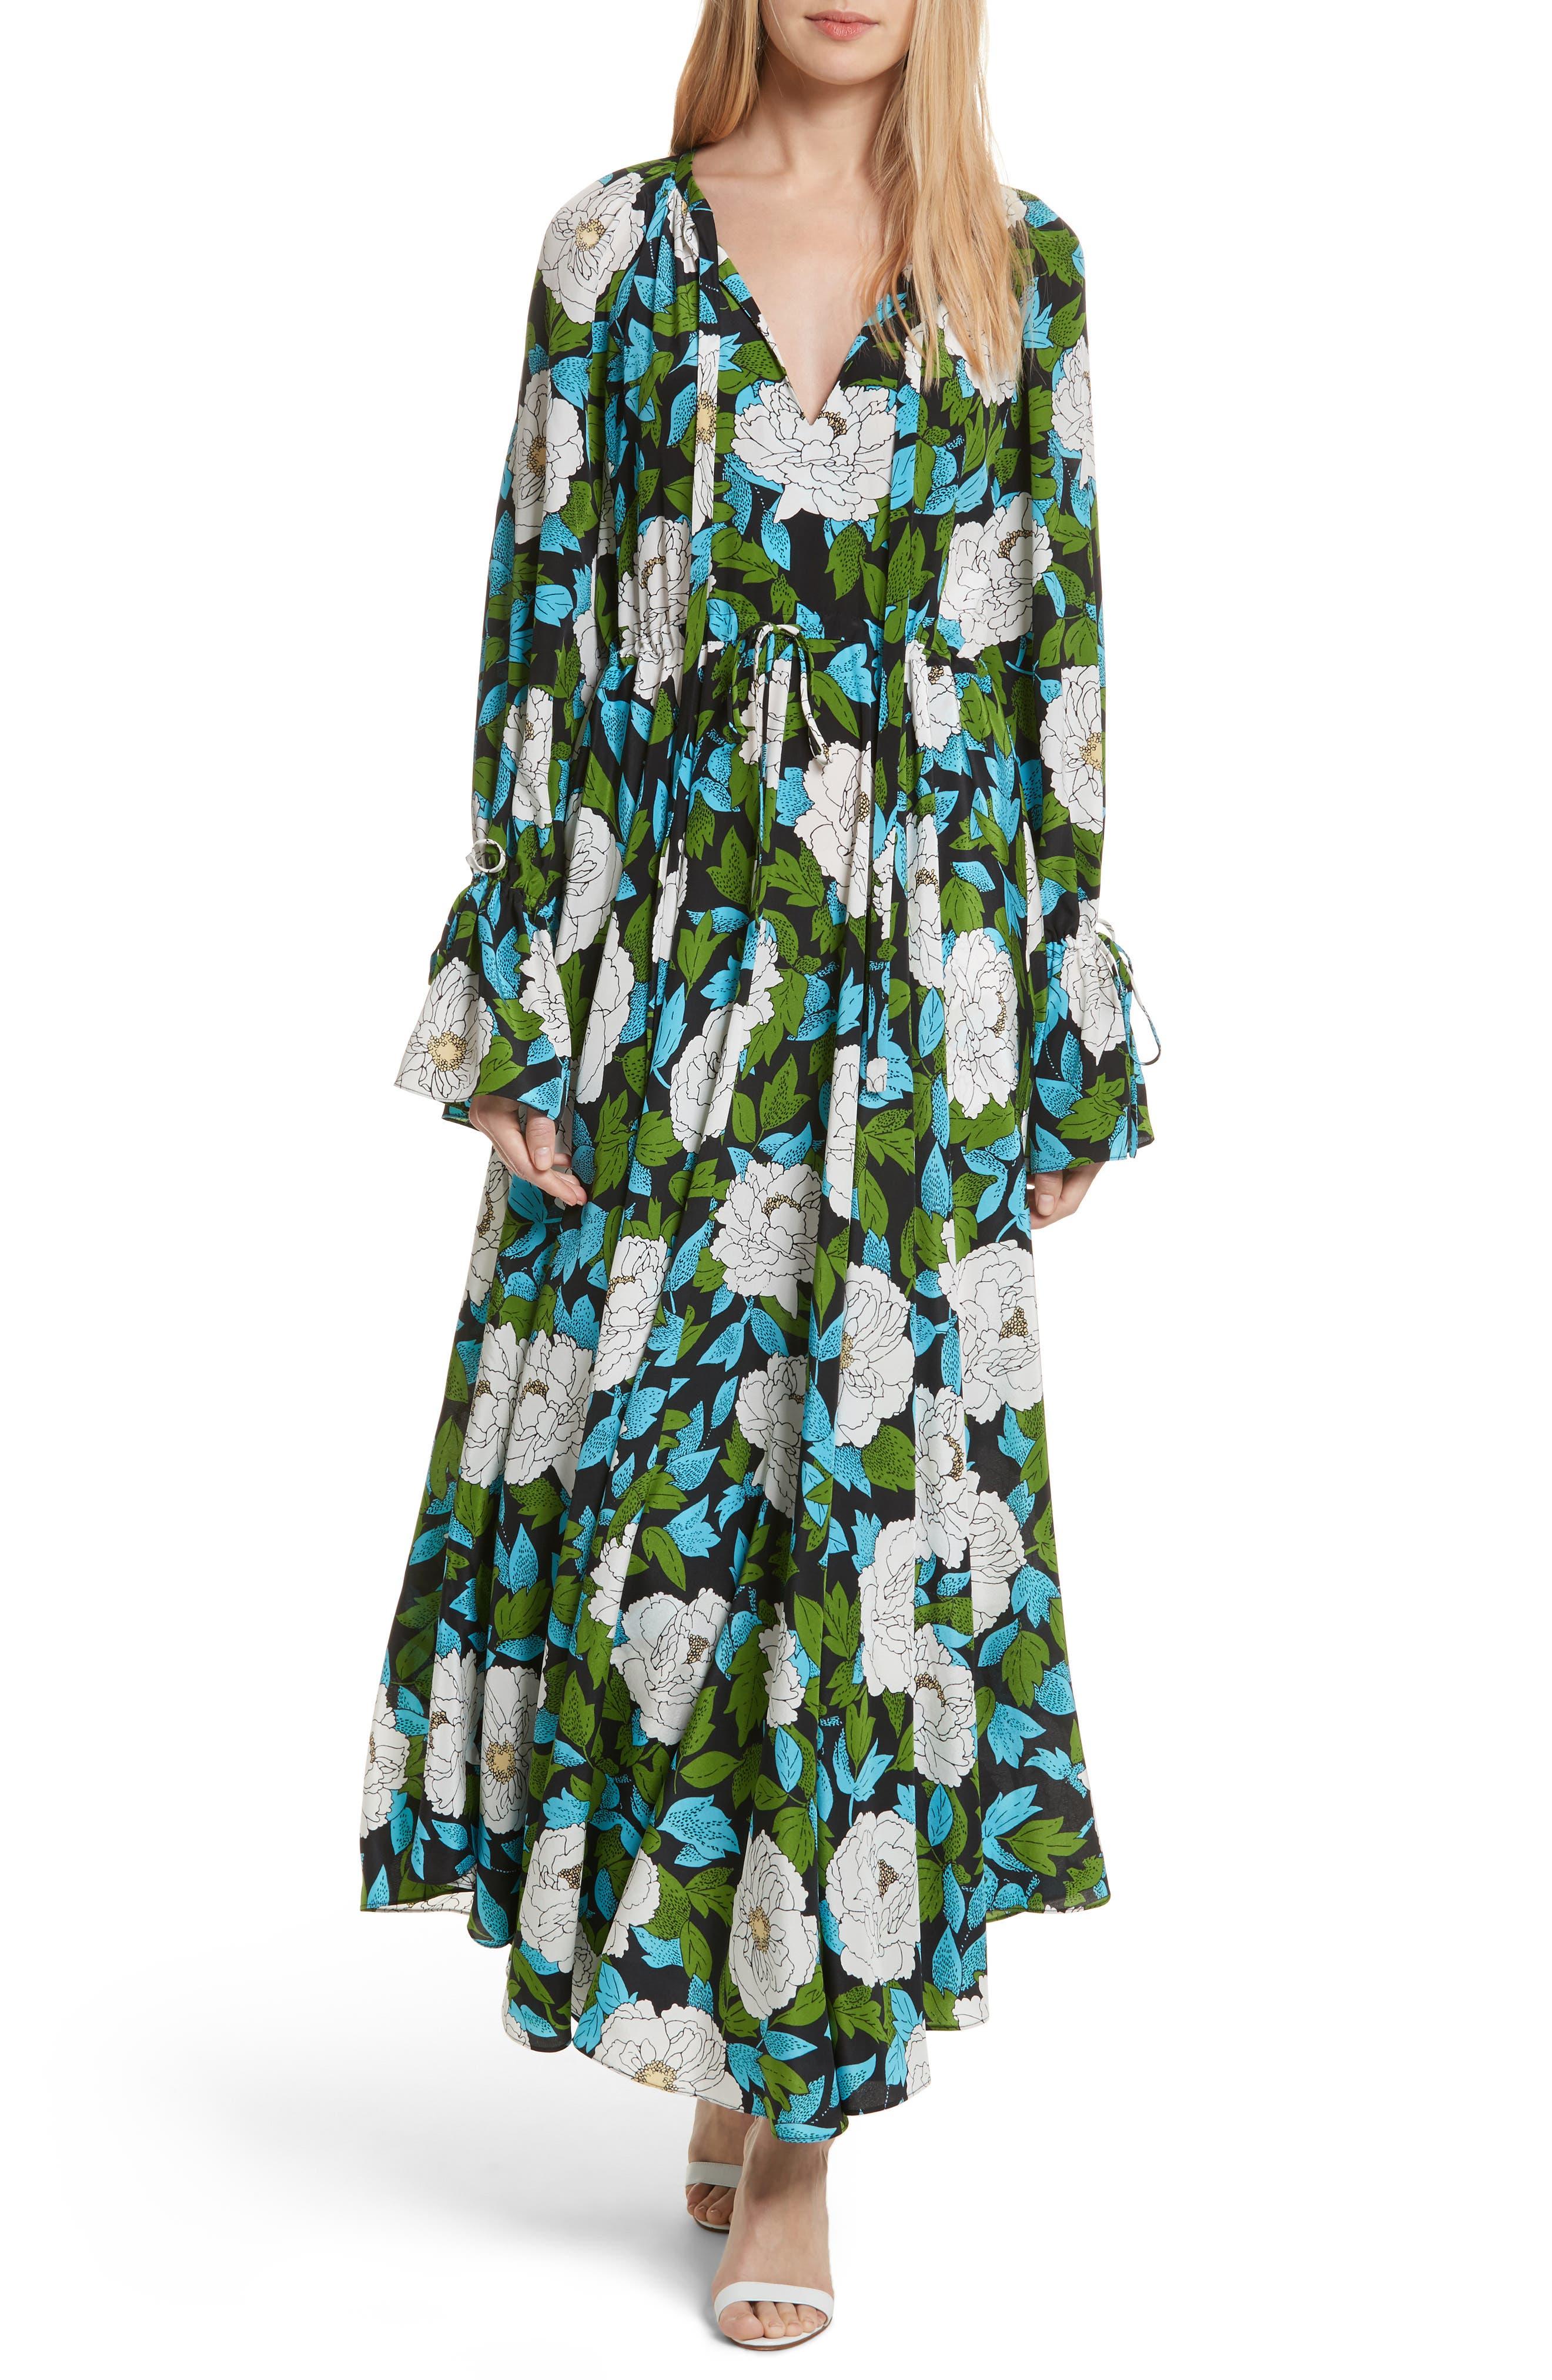 Diane von Furstenberg Floral Silk Maxi Dress,                             Main thumbnail 1, color,                             389